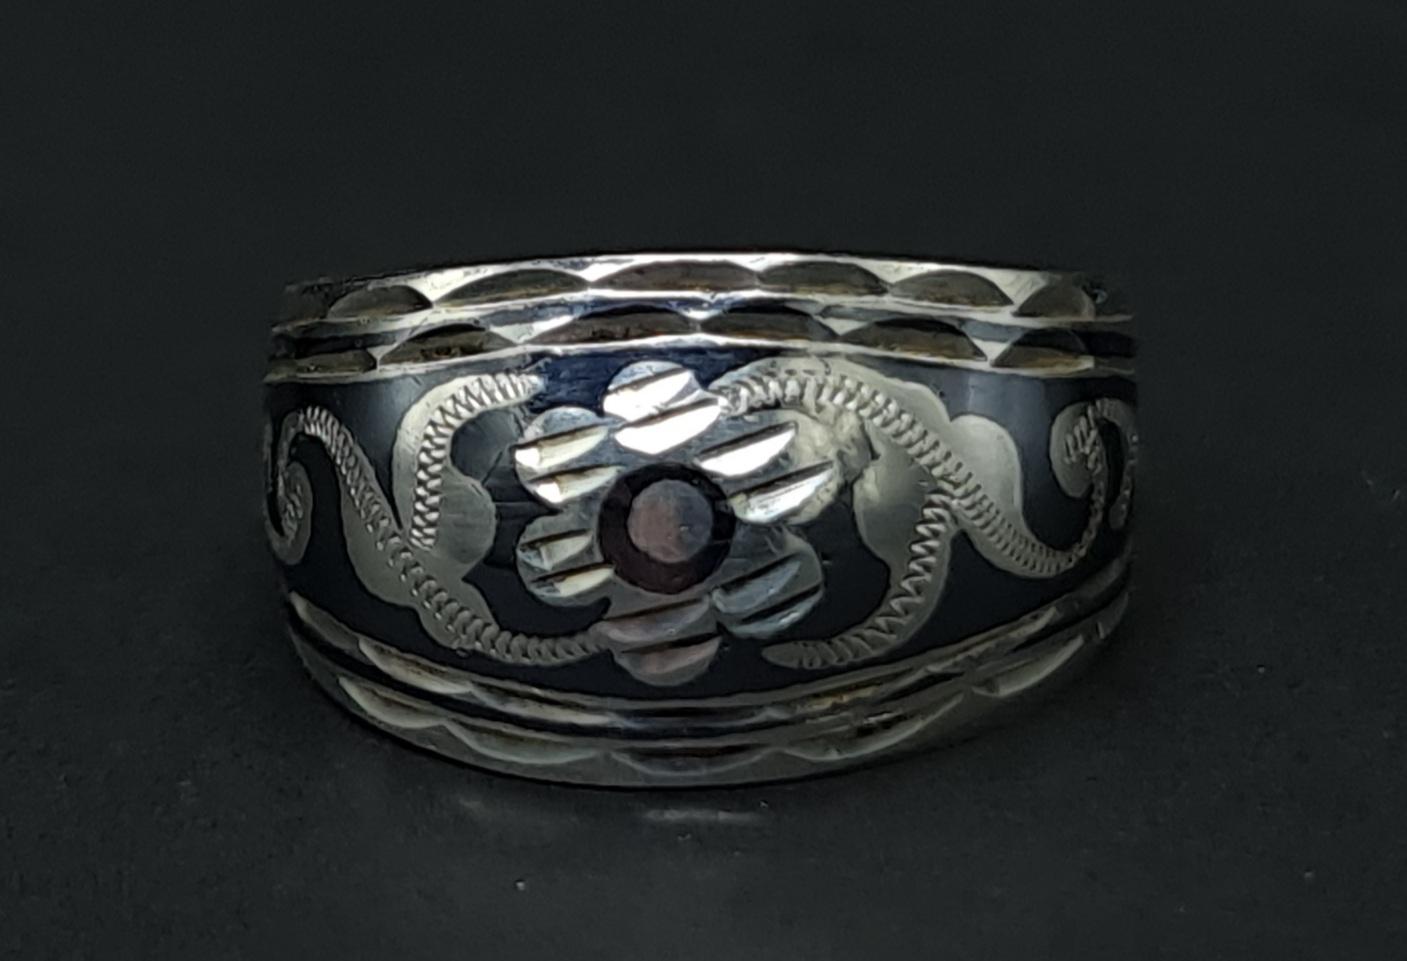 ussr silver ring 875 zilver russian ring 875 russisch zilver russia silver ring niello russia skoander.com ring rusland 875 zilver :bhp hallmark russian silver russisch zilver ring